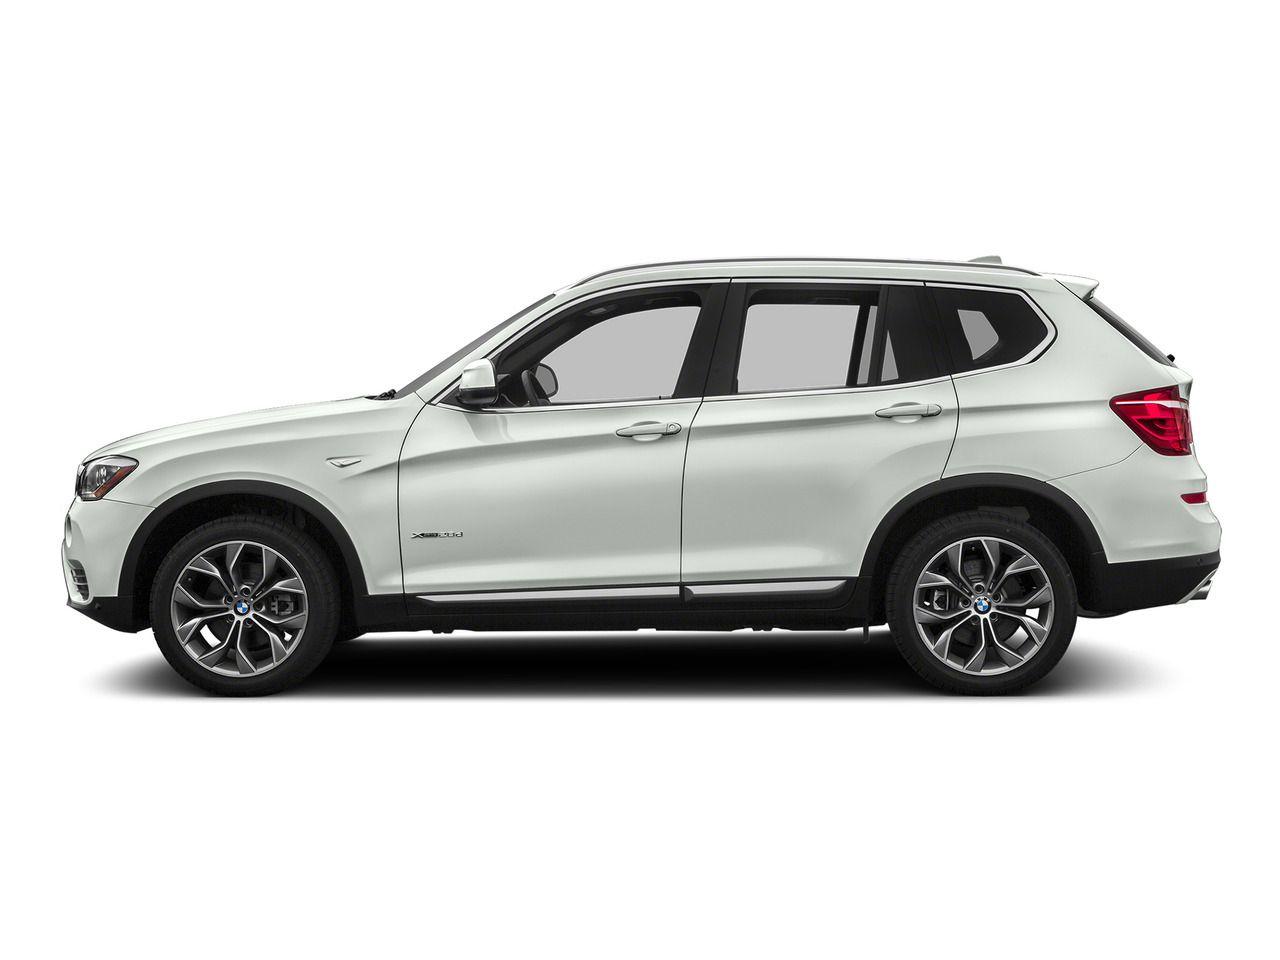 2016 BMW X3 Image